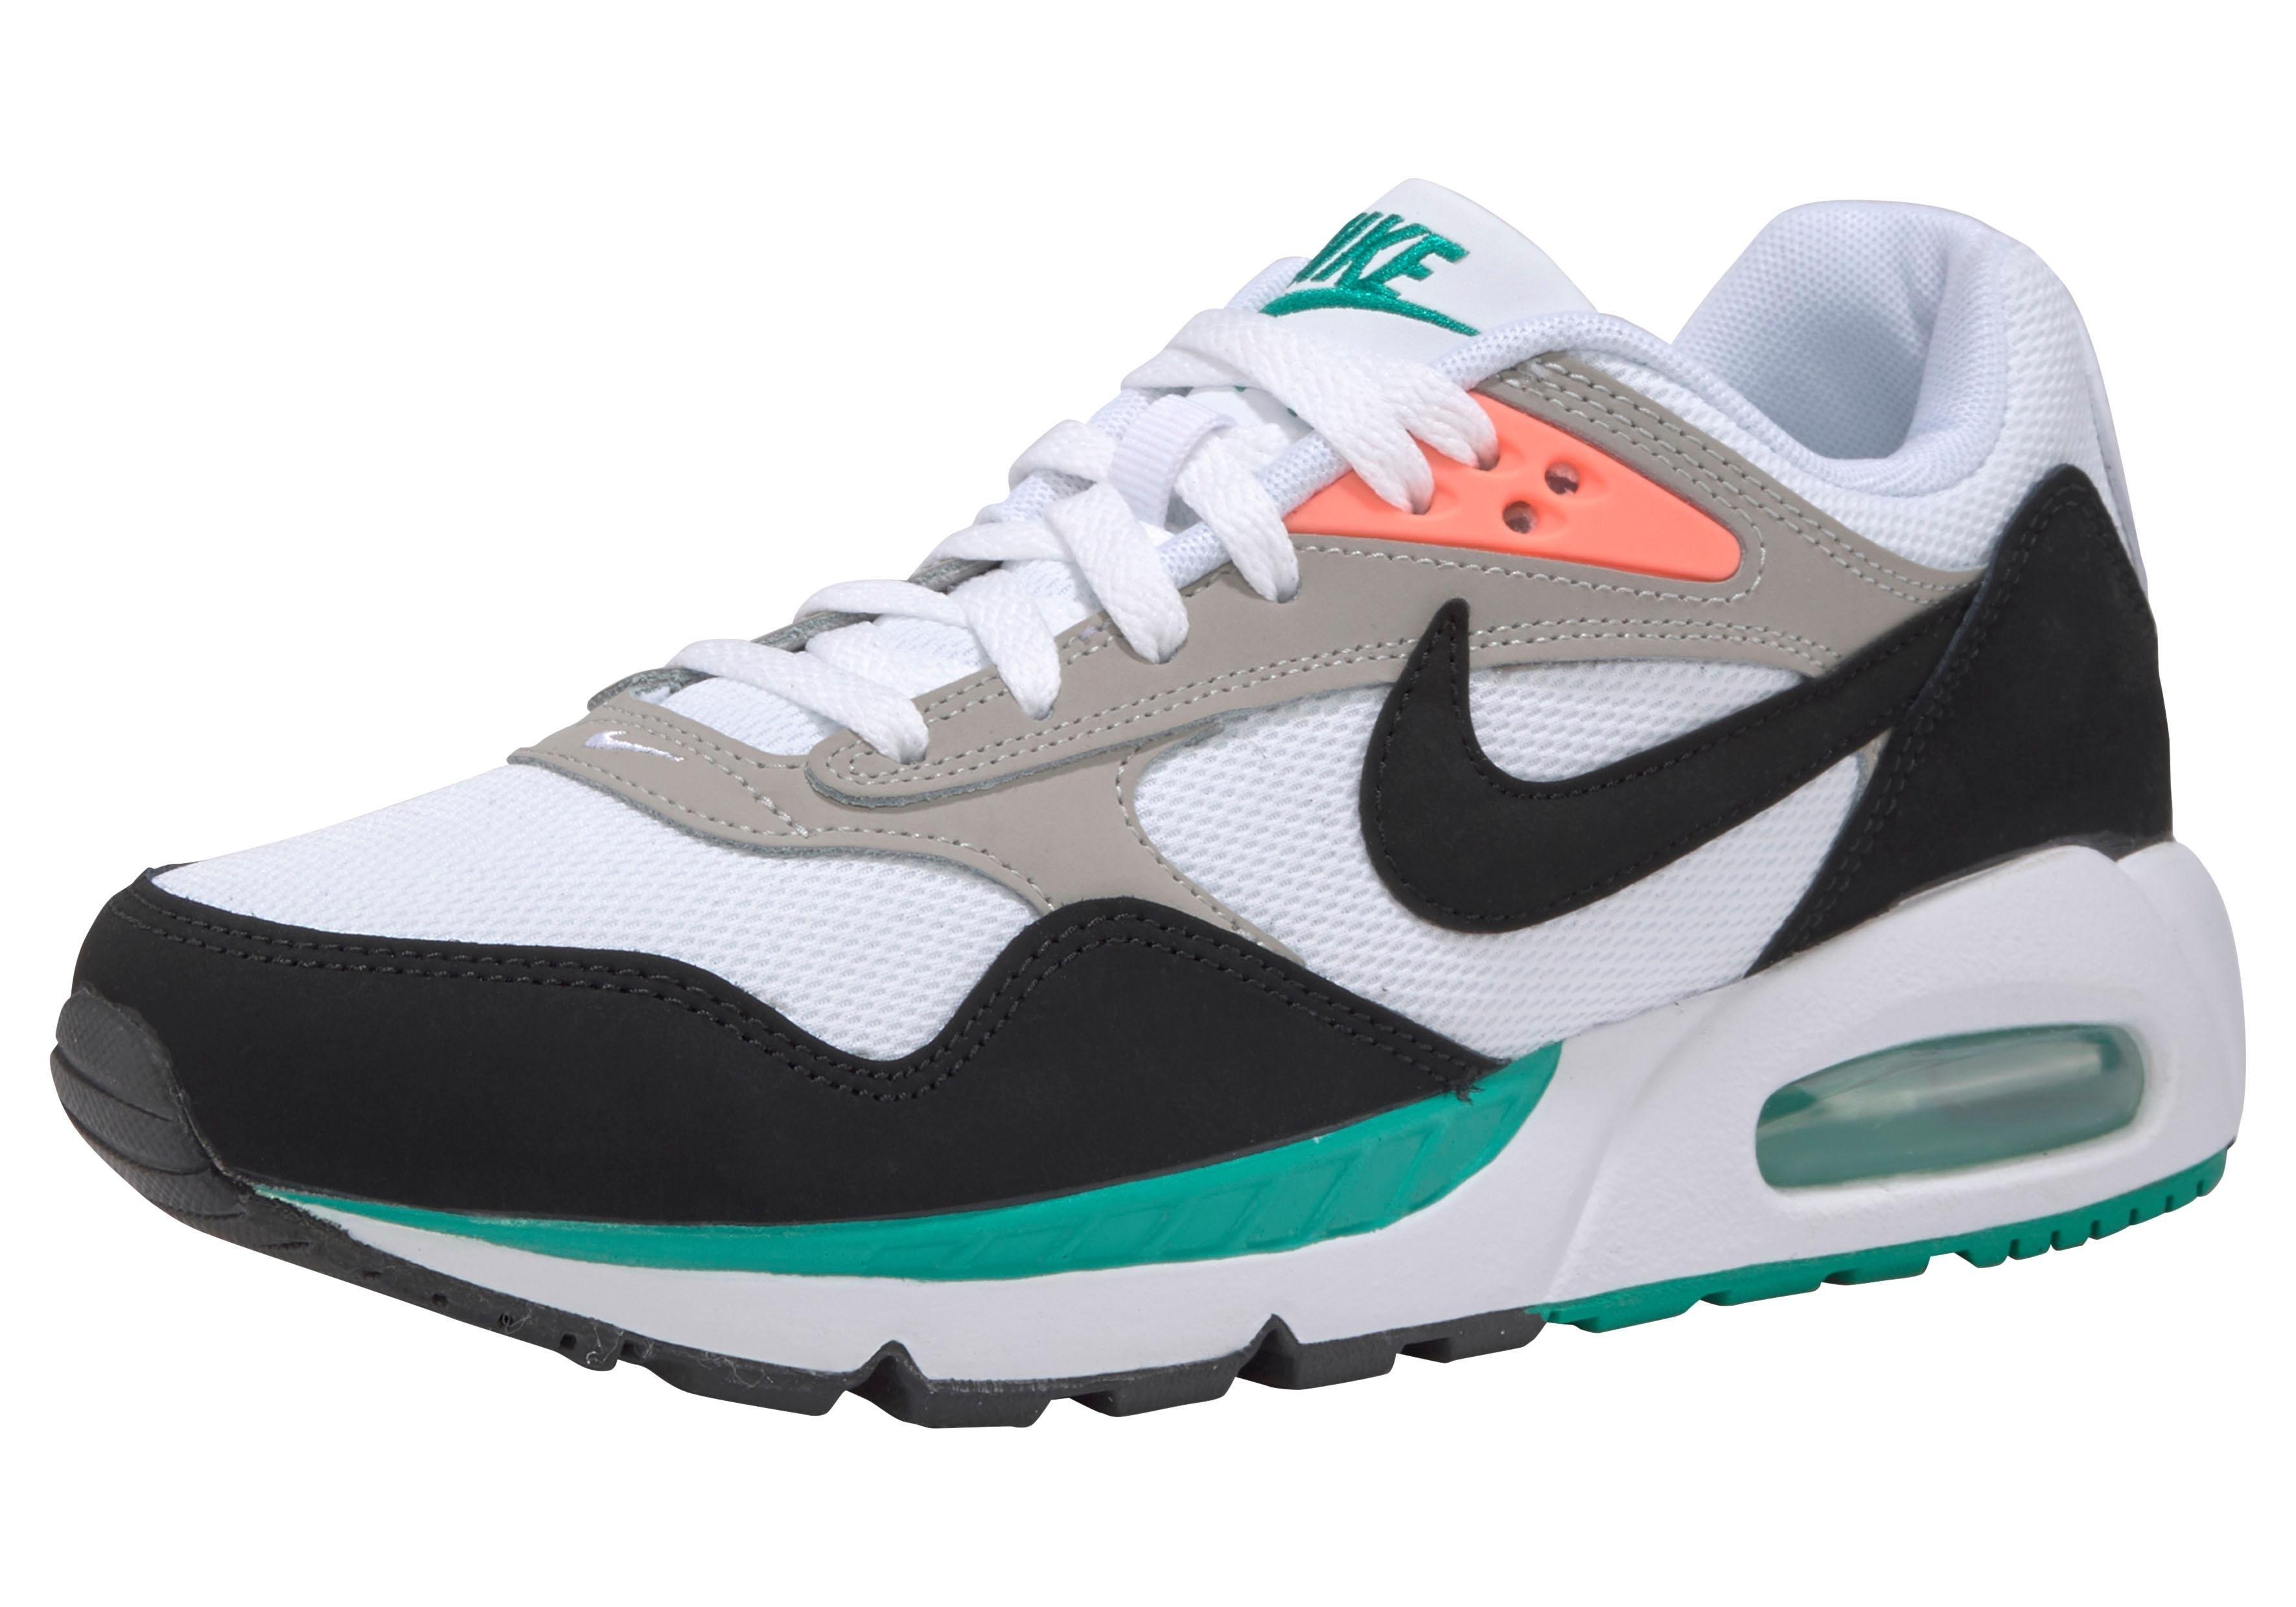 81eff29a013562 ... Nike Sportswear sneakers »Wmns Air Max Axis«, Nike Sportswear sneakers  »Wmns Internationalist«, NIKE sneakers »Tanjun Wmns«, Nike Sportswear  sneakers » ...